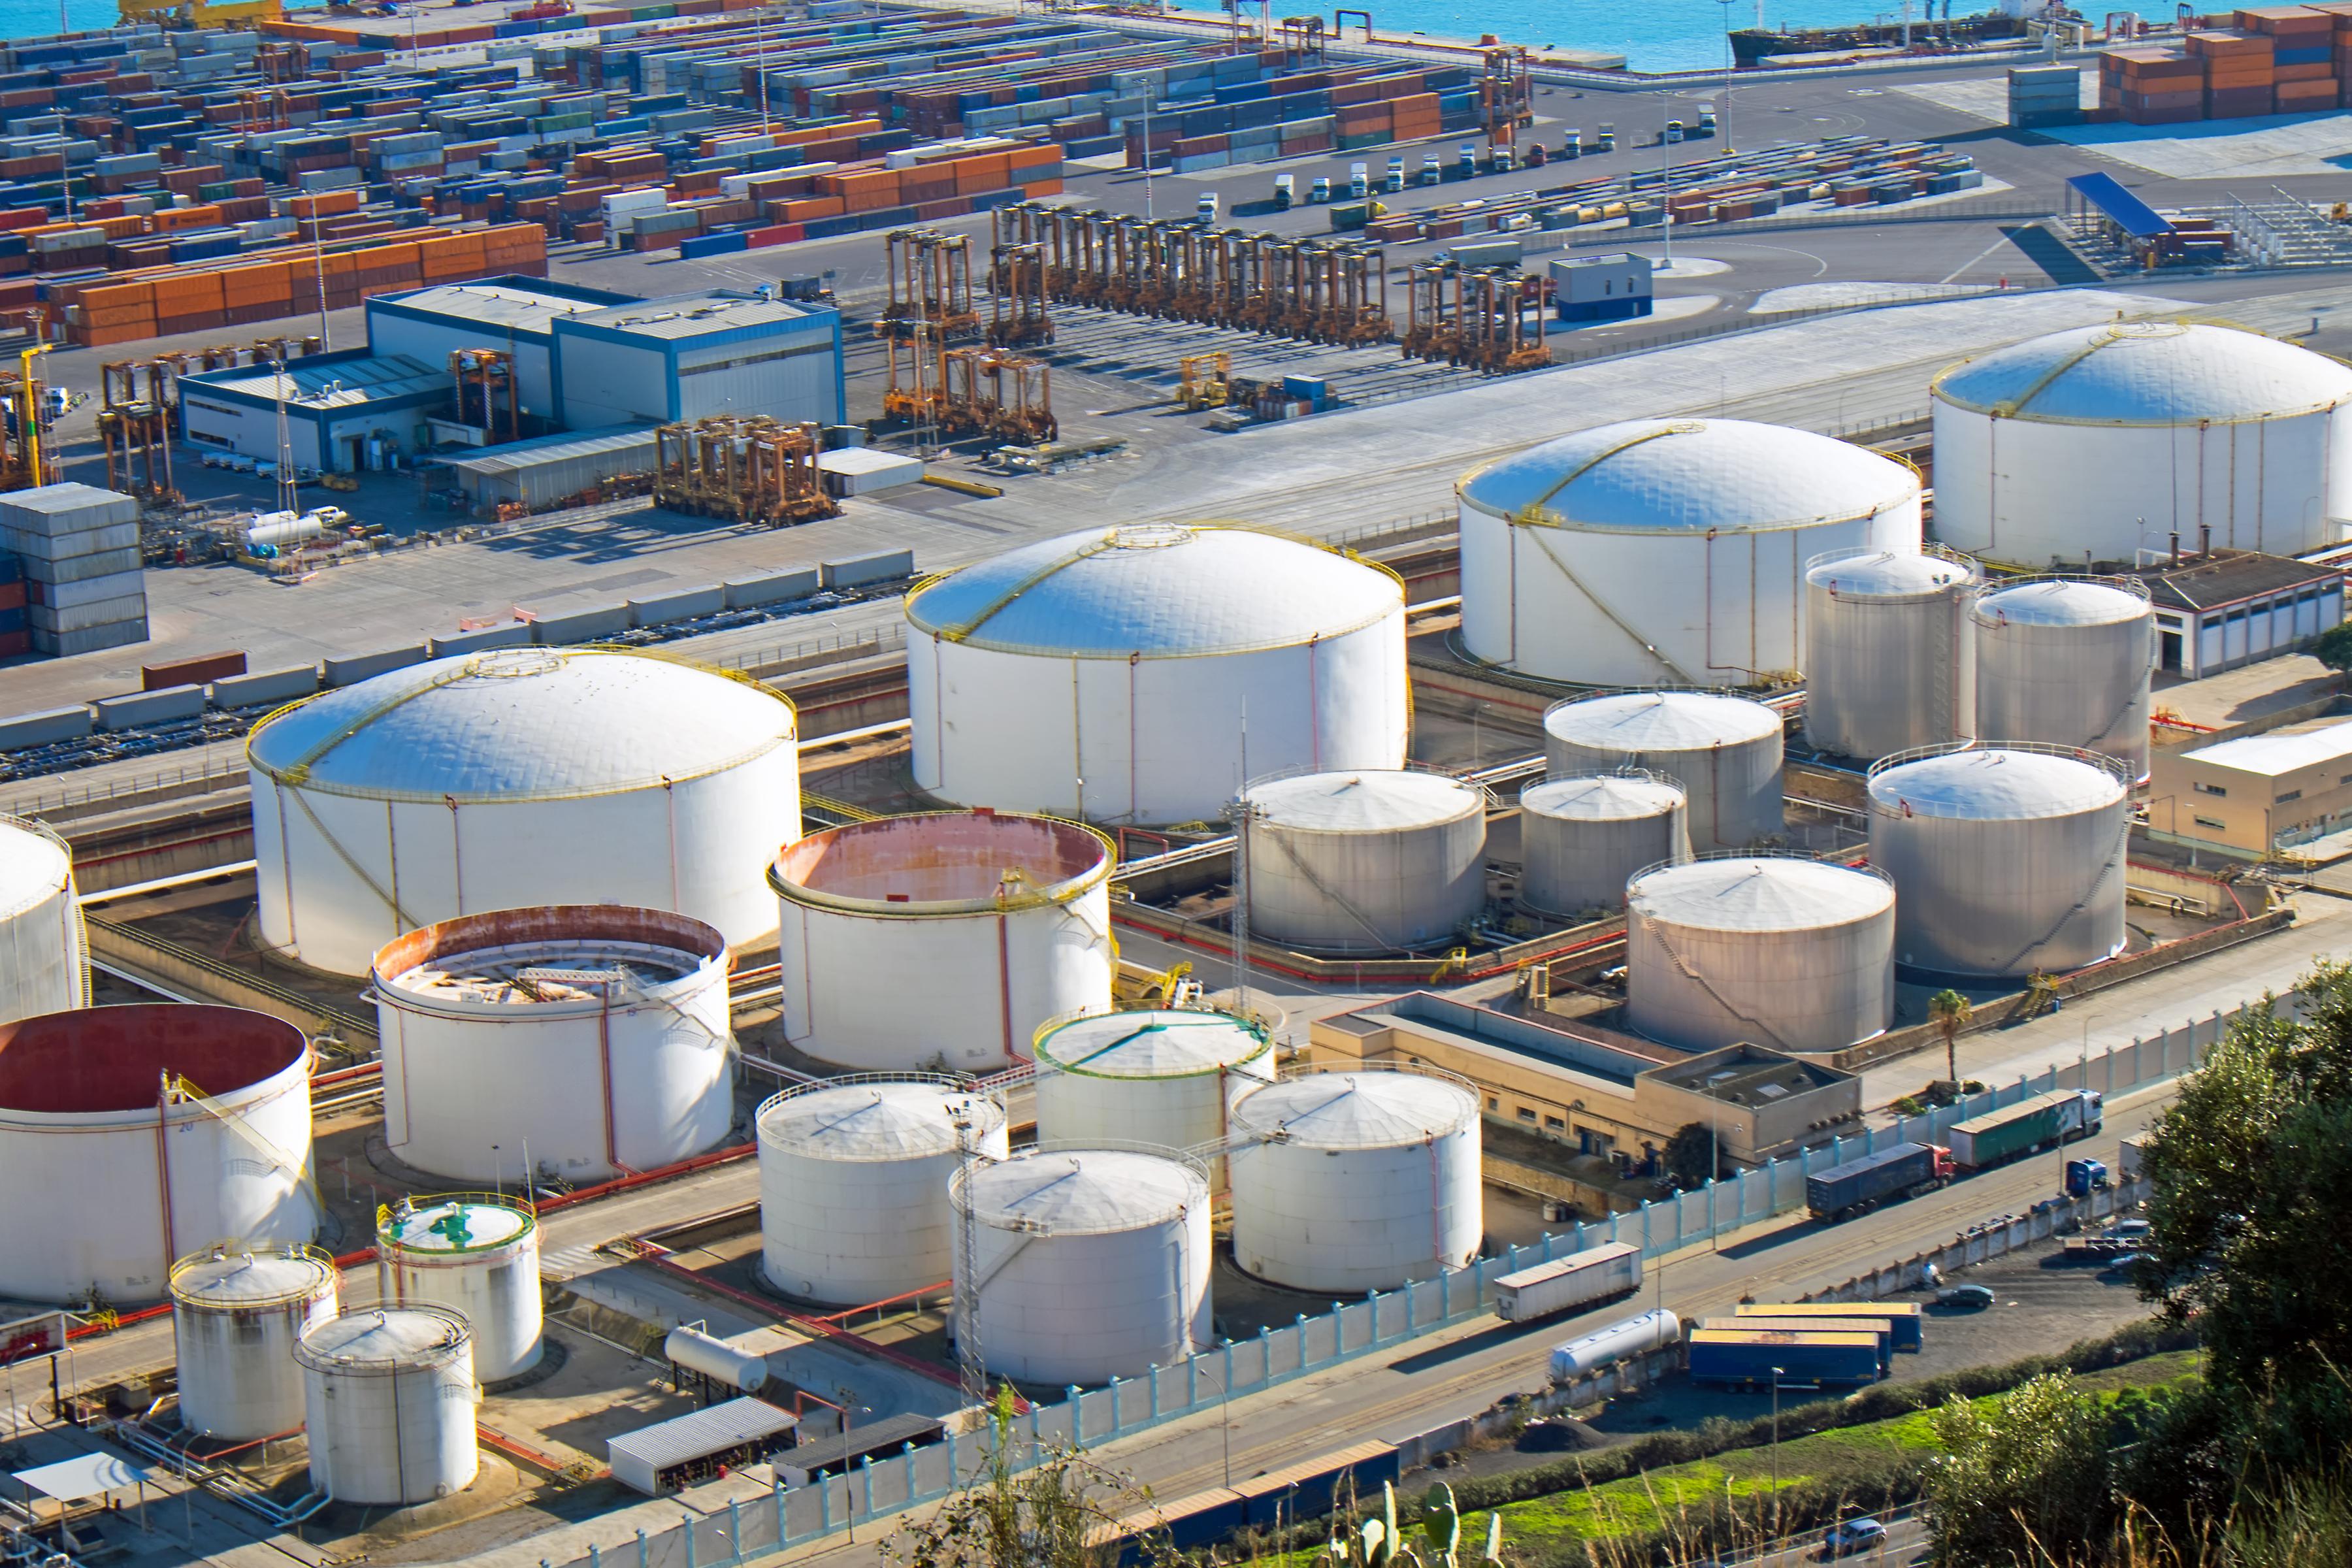 Oil storage facility